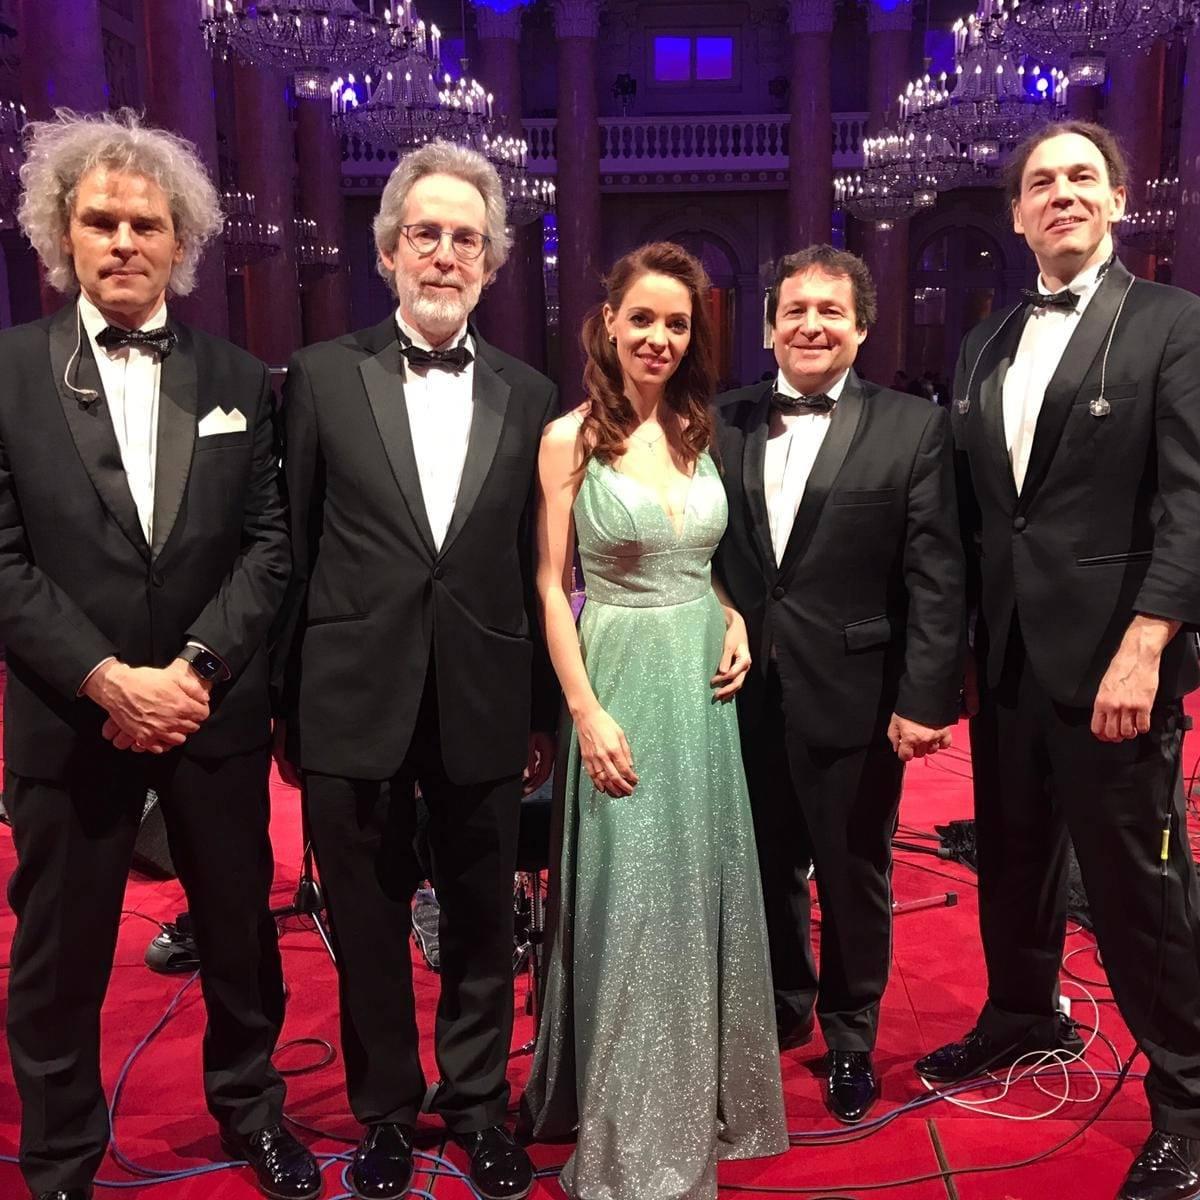 Joe Hofbauer Quintett in der Wiener Hofburg